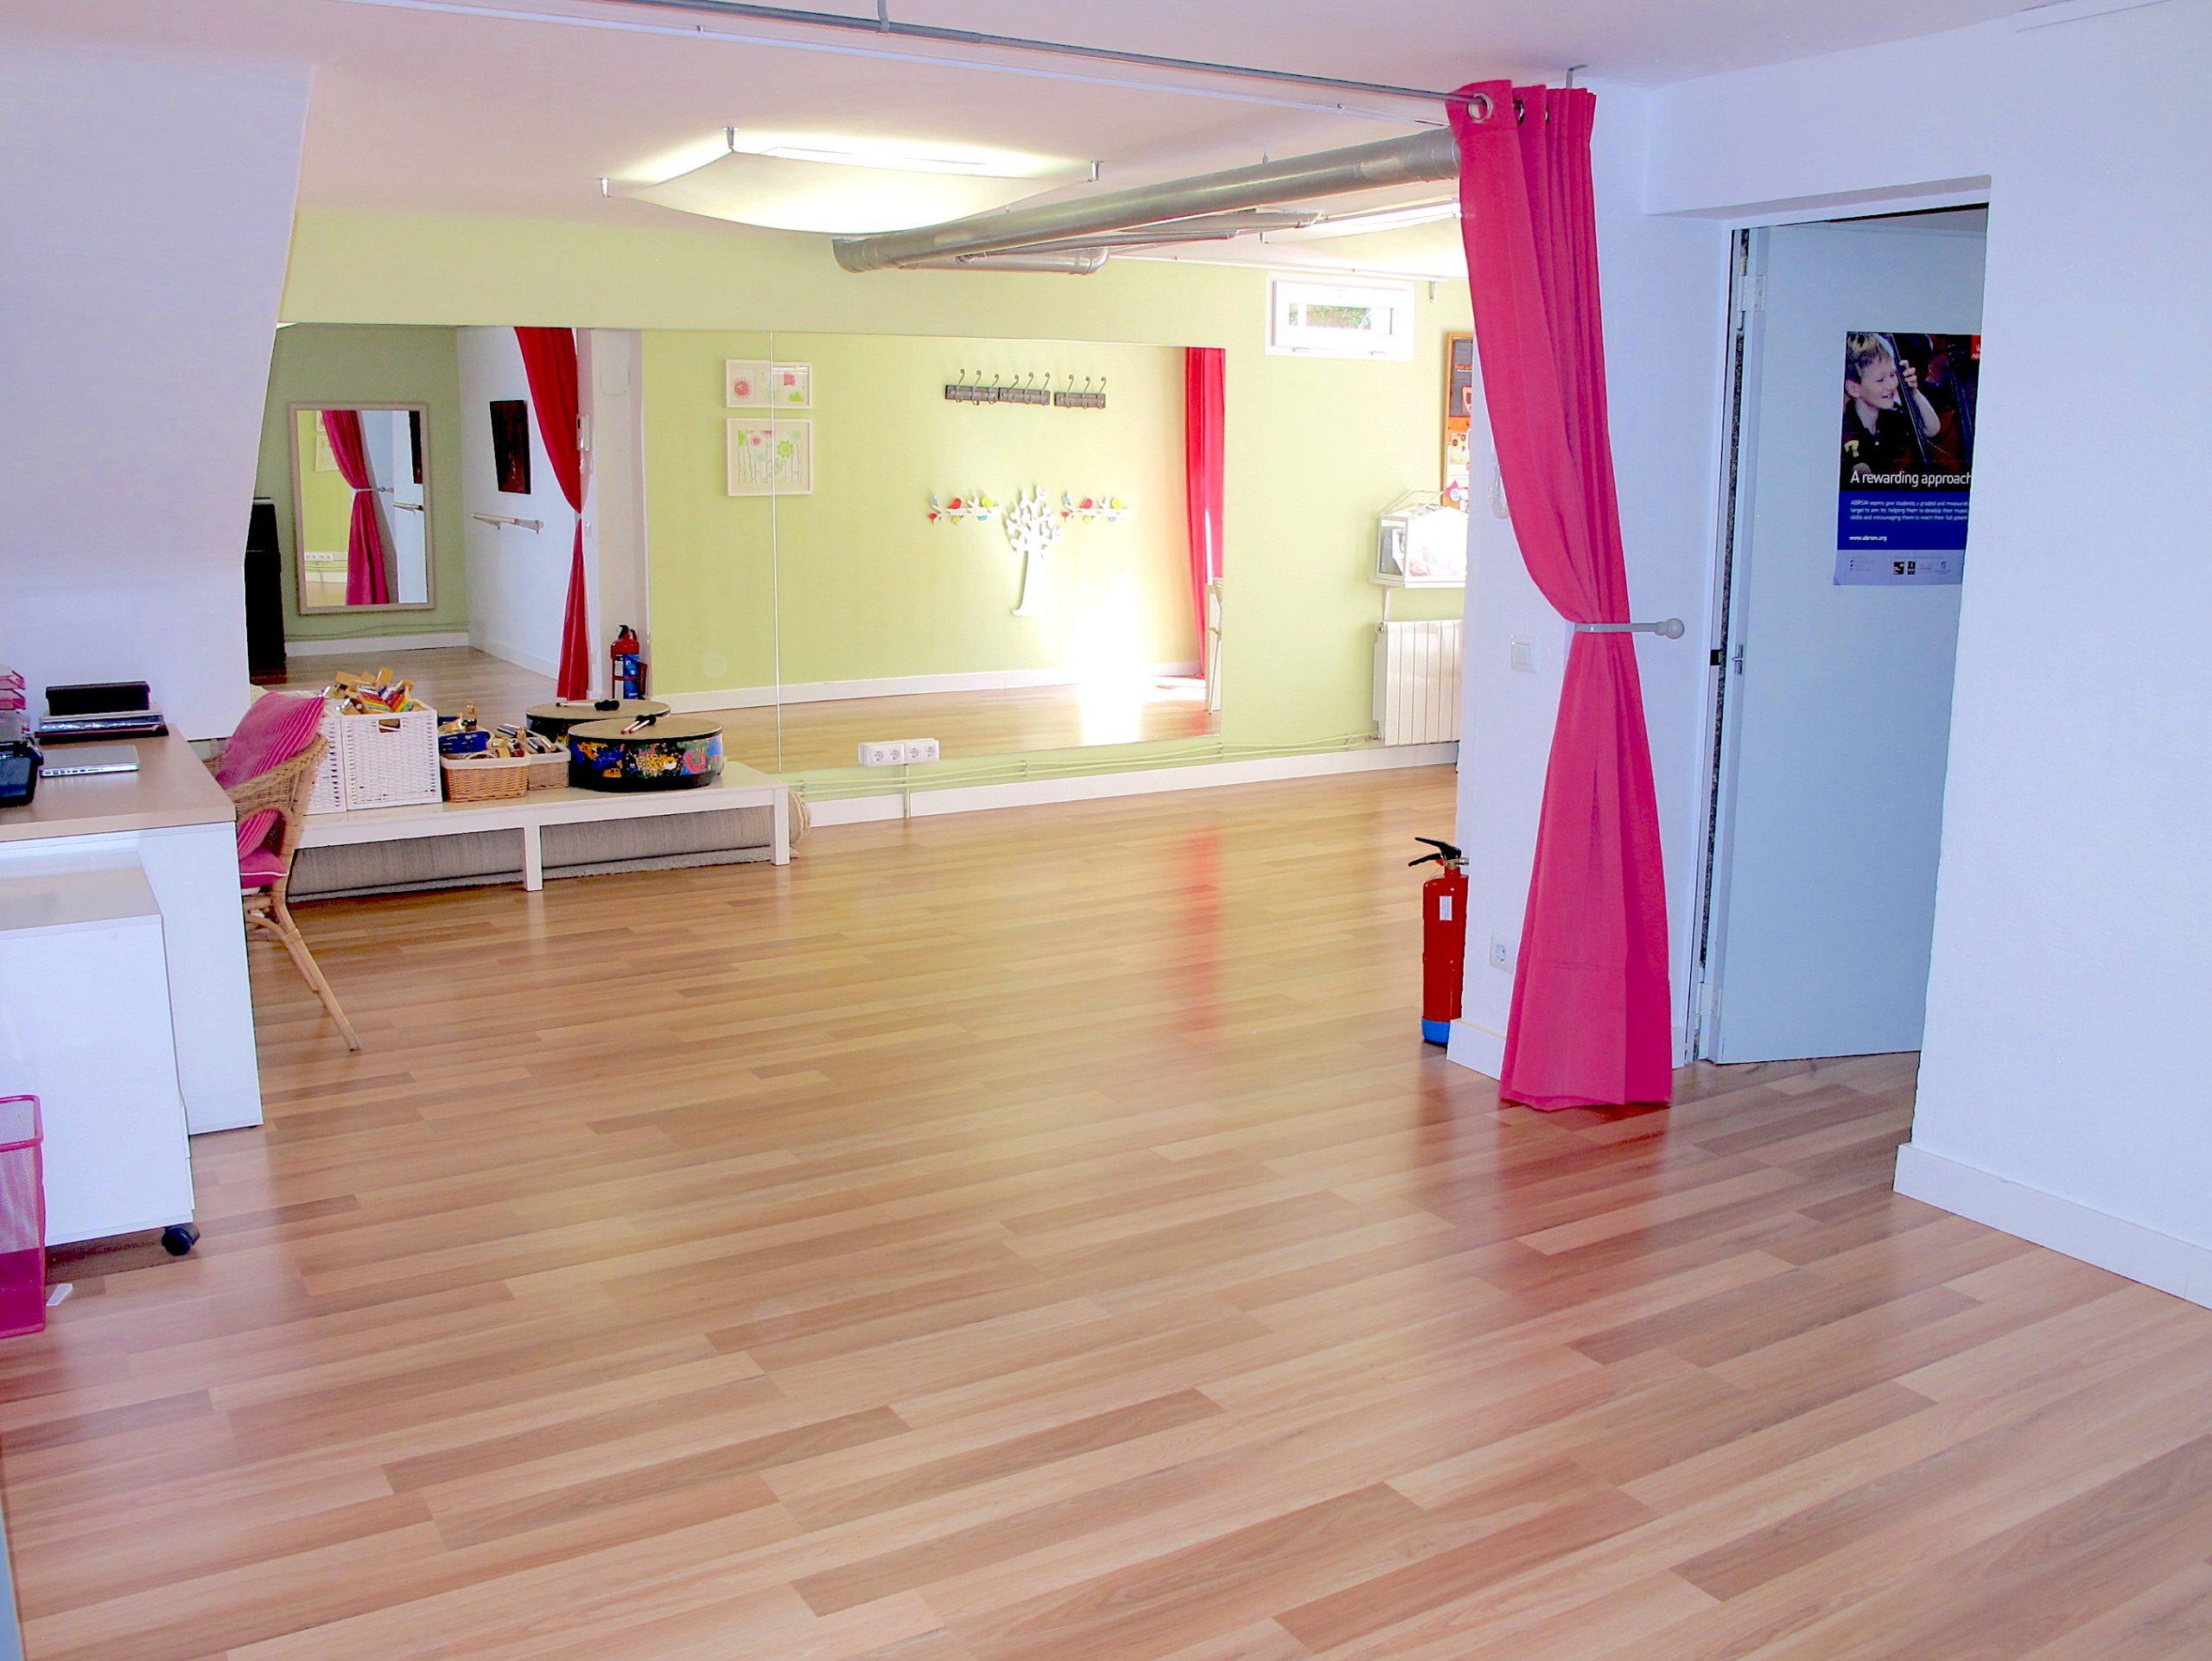 2. Aula 1 completa sin alfombra